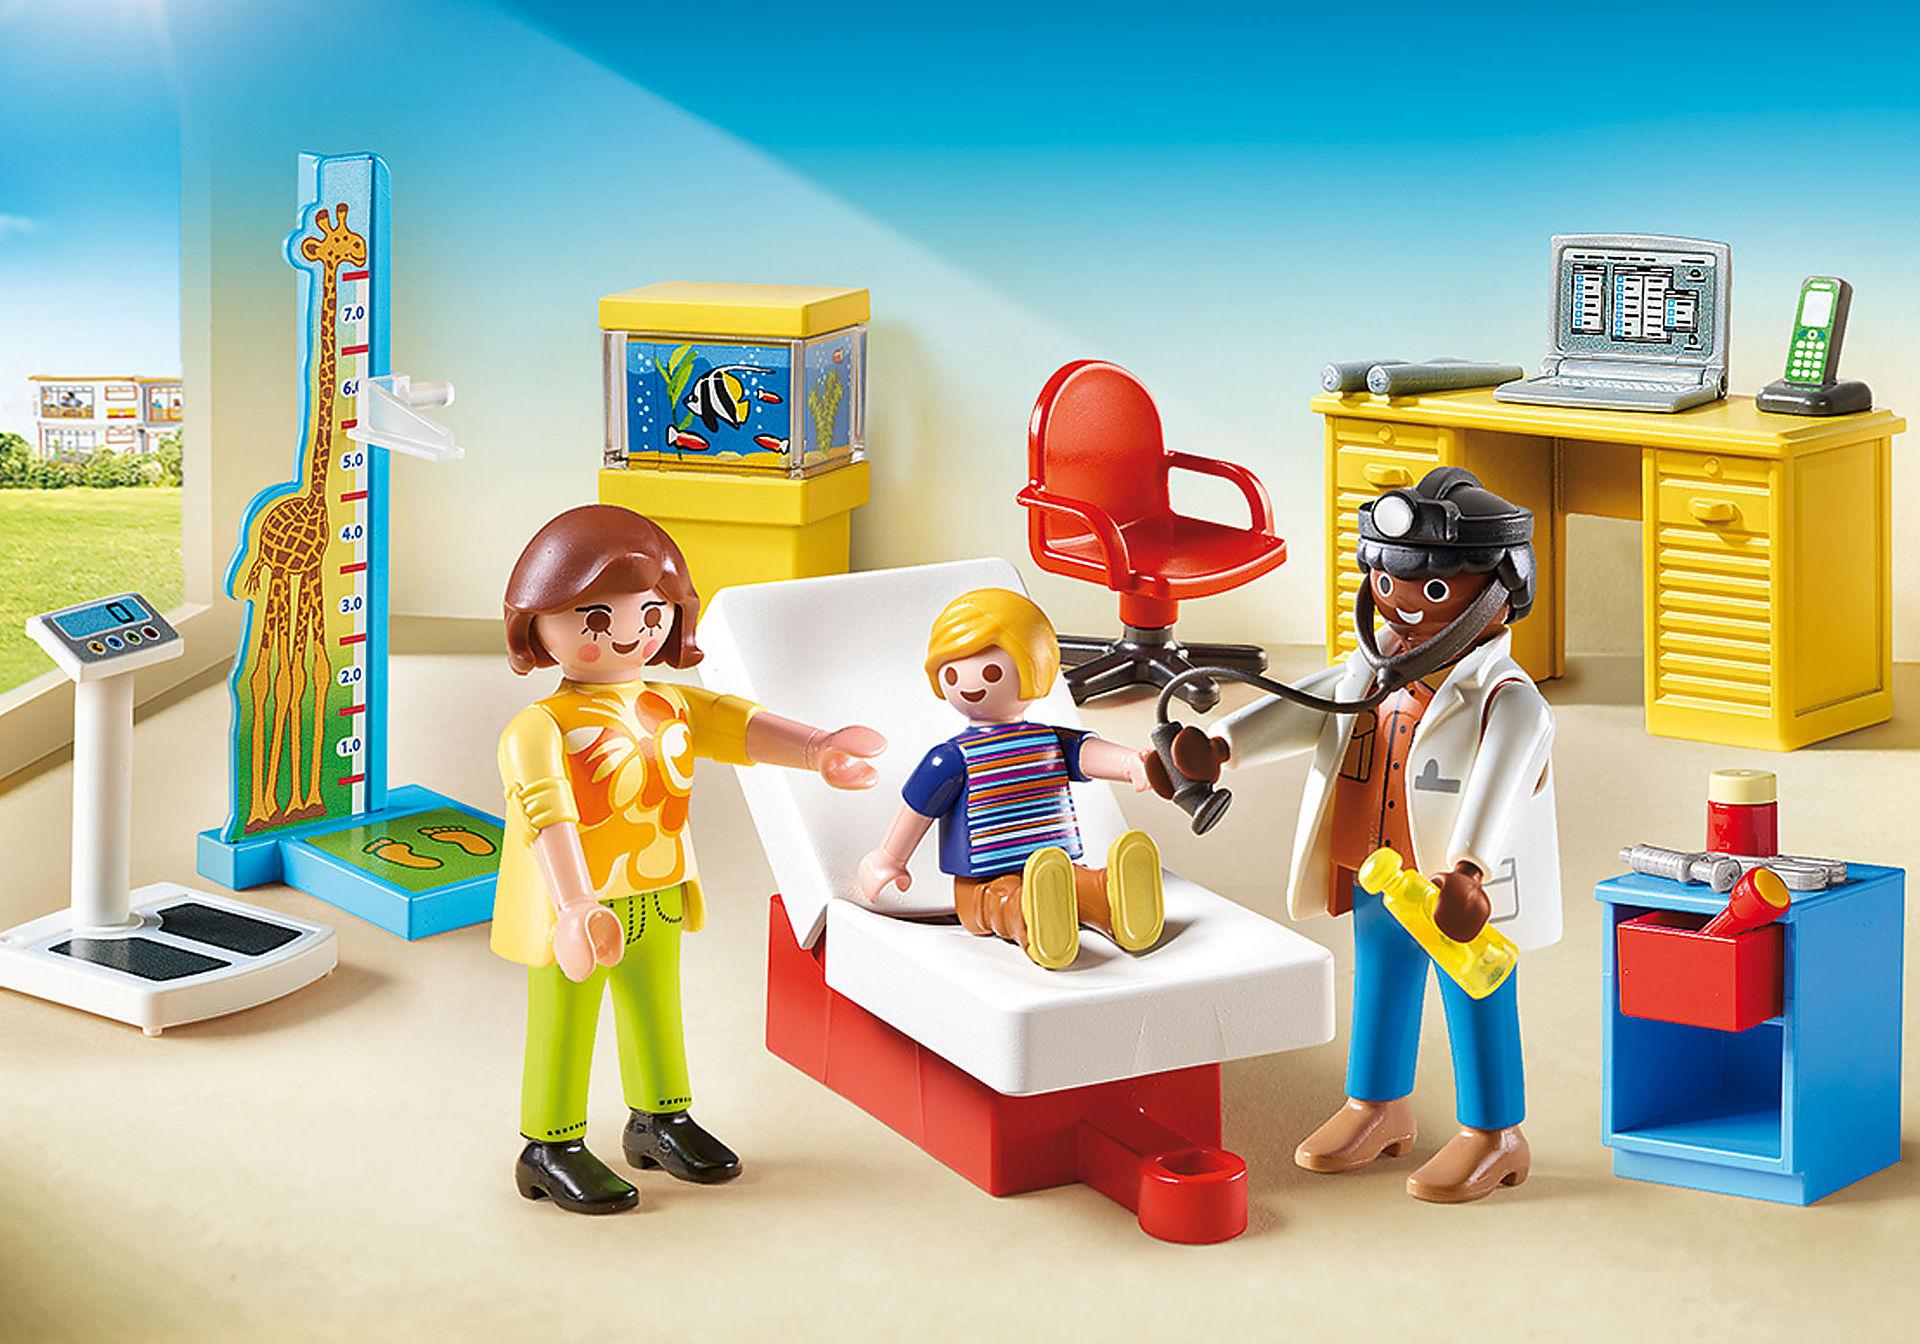 70034 Starter Pack Visita dal Pediatra zoom image1